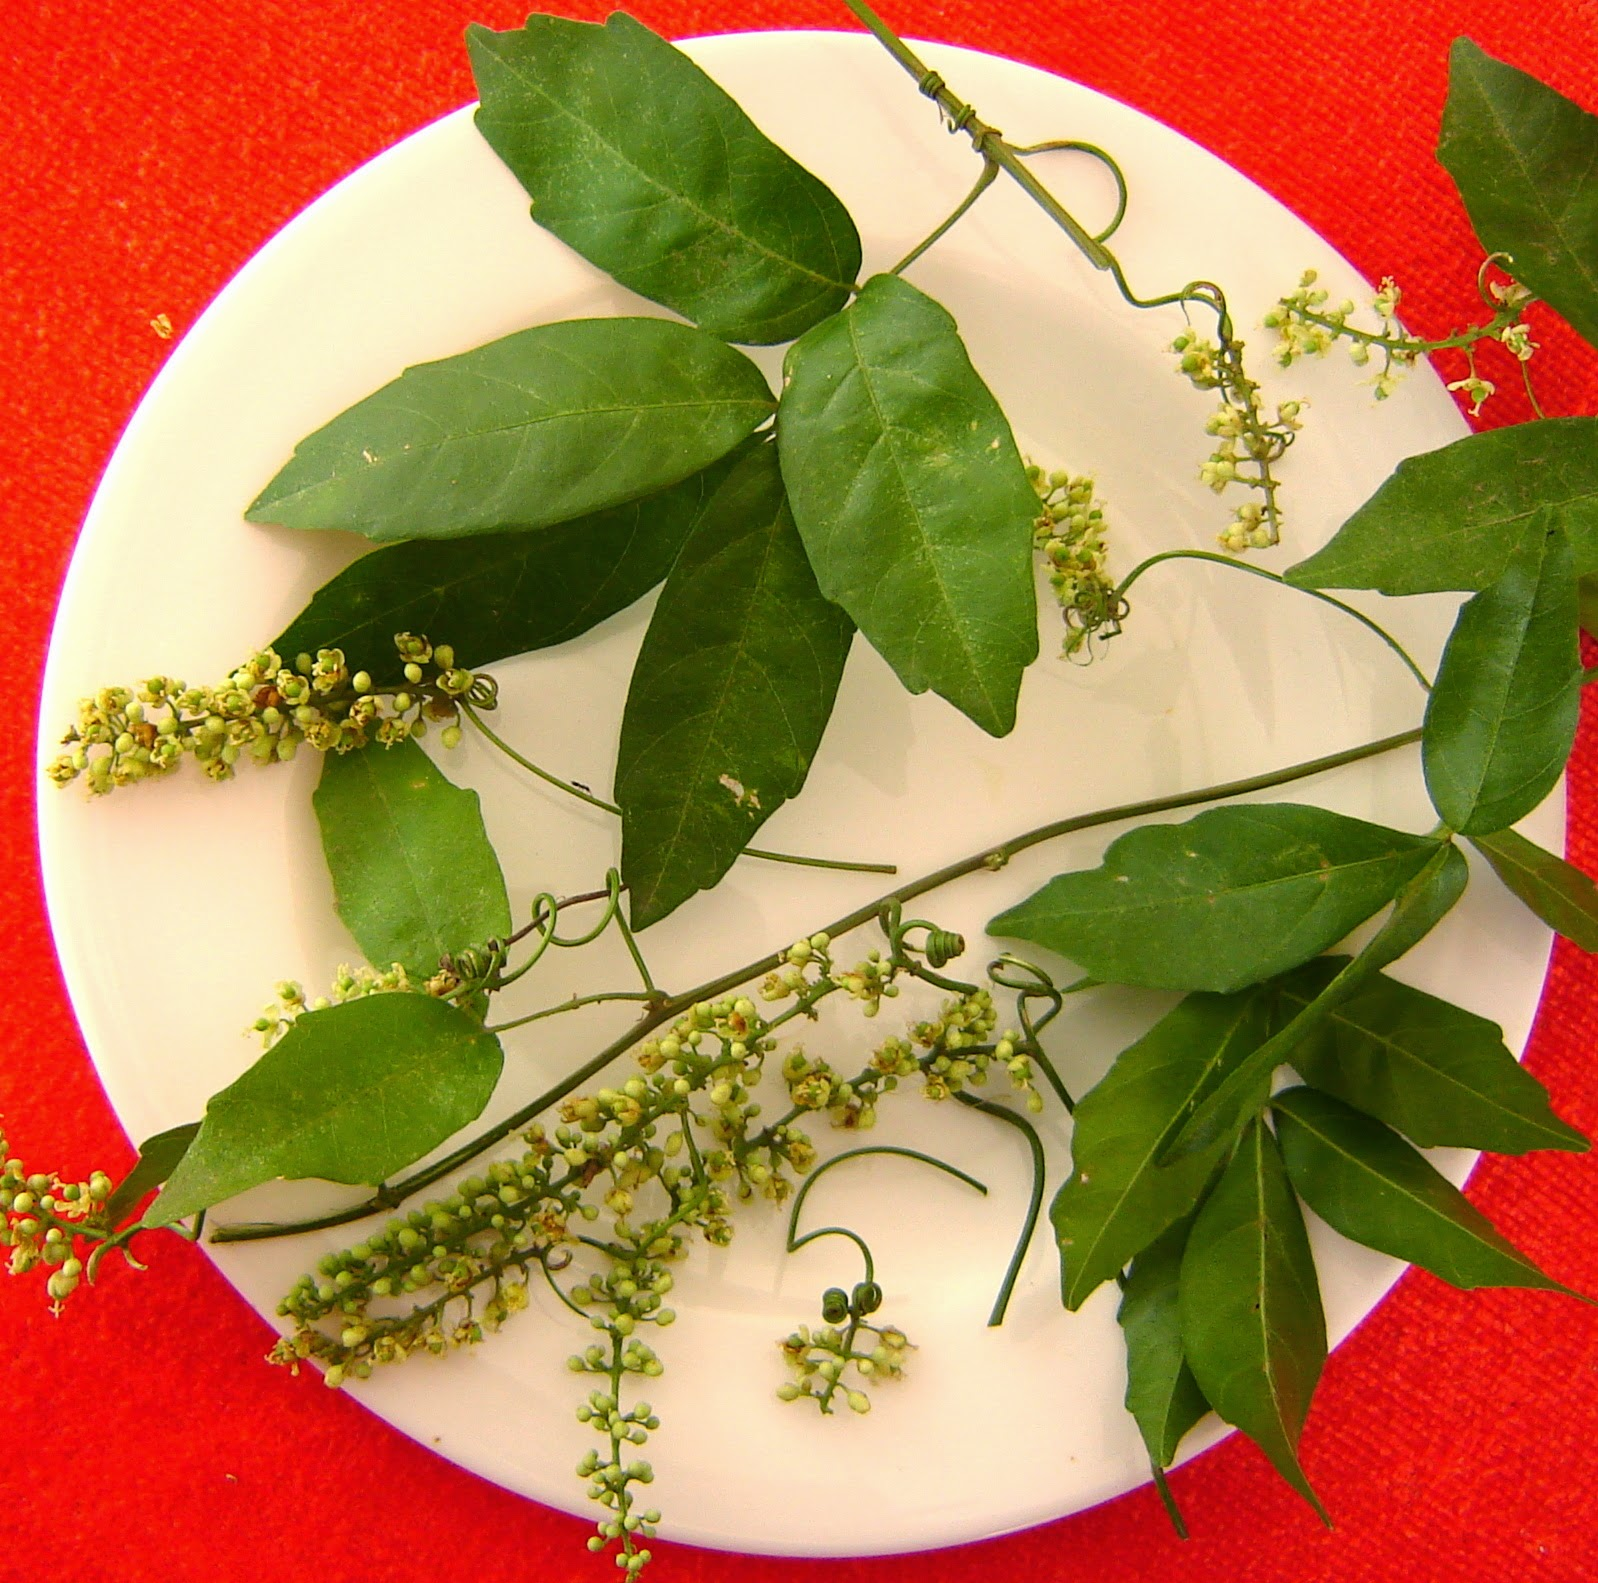 V e r d e c h a c o abril 2011 for Planta venenosa decorativa